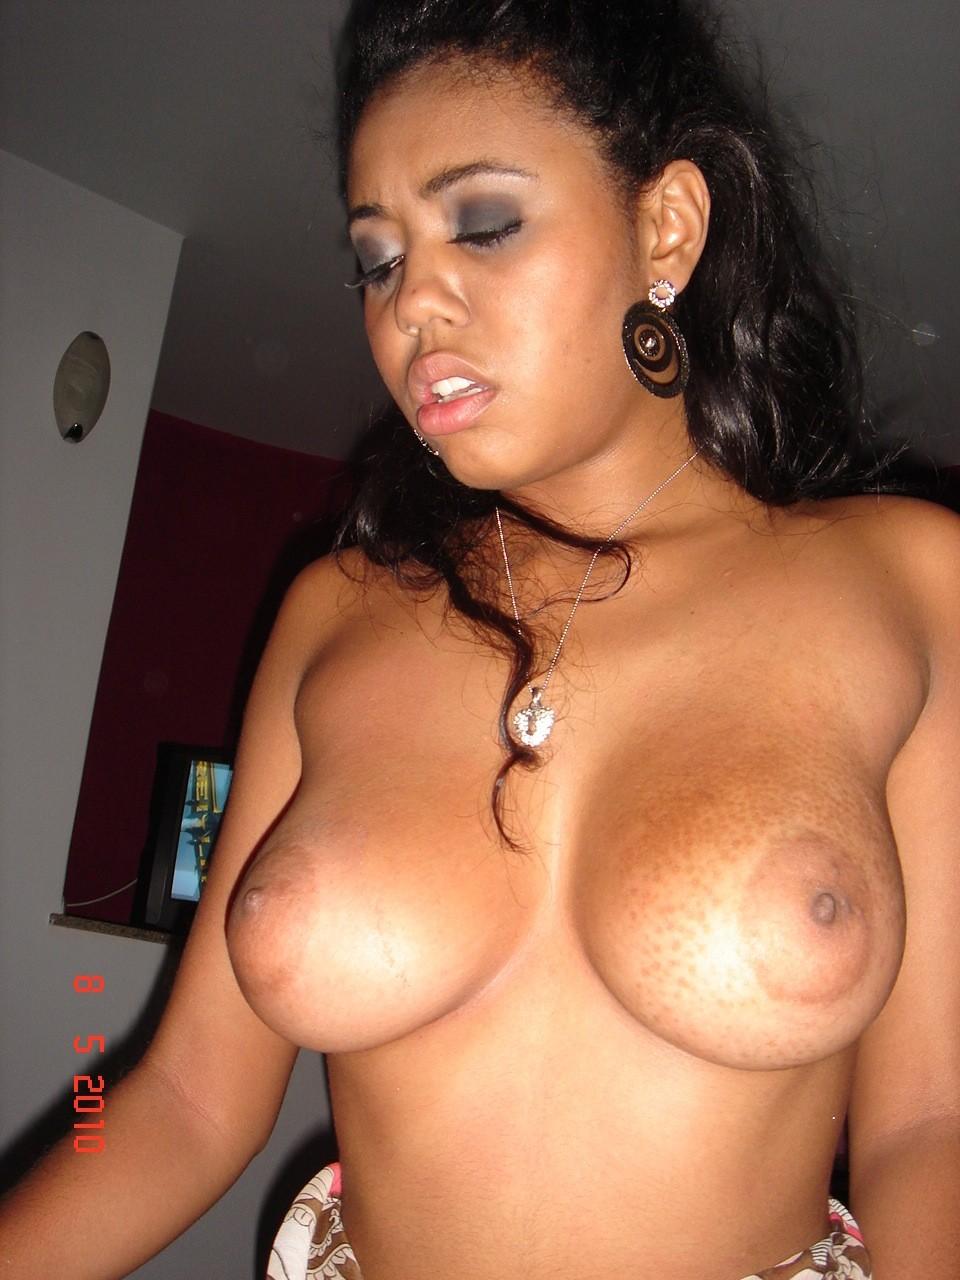 Ashley whitt nude